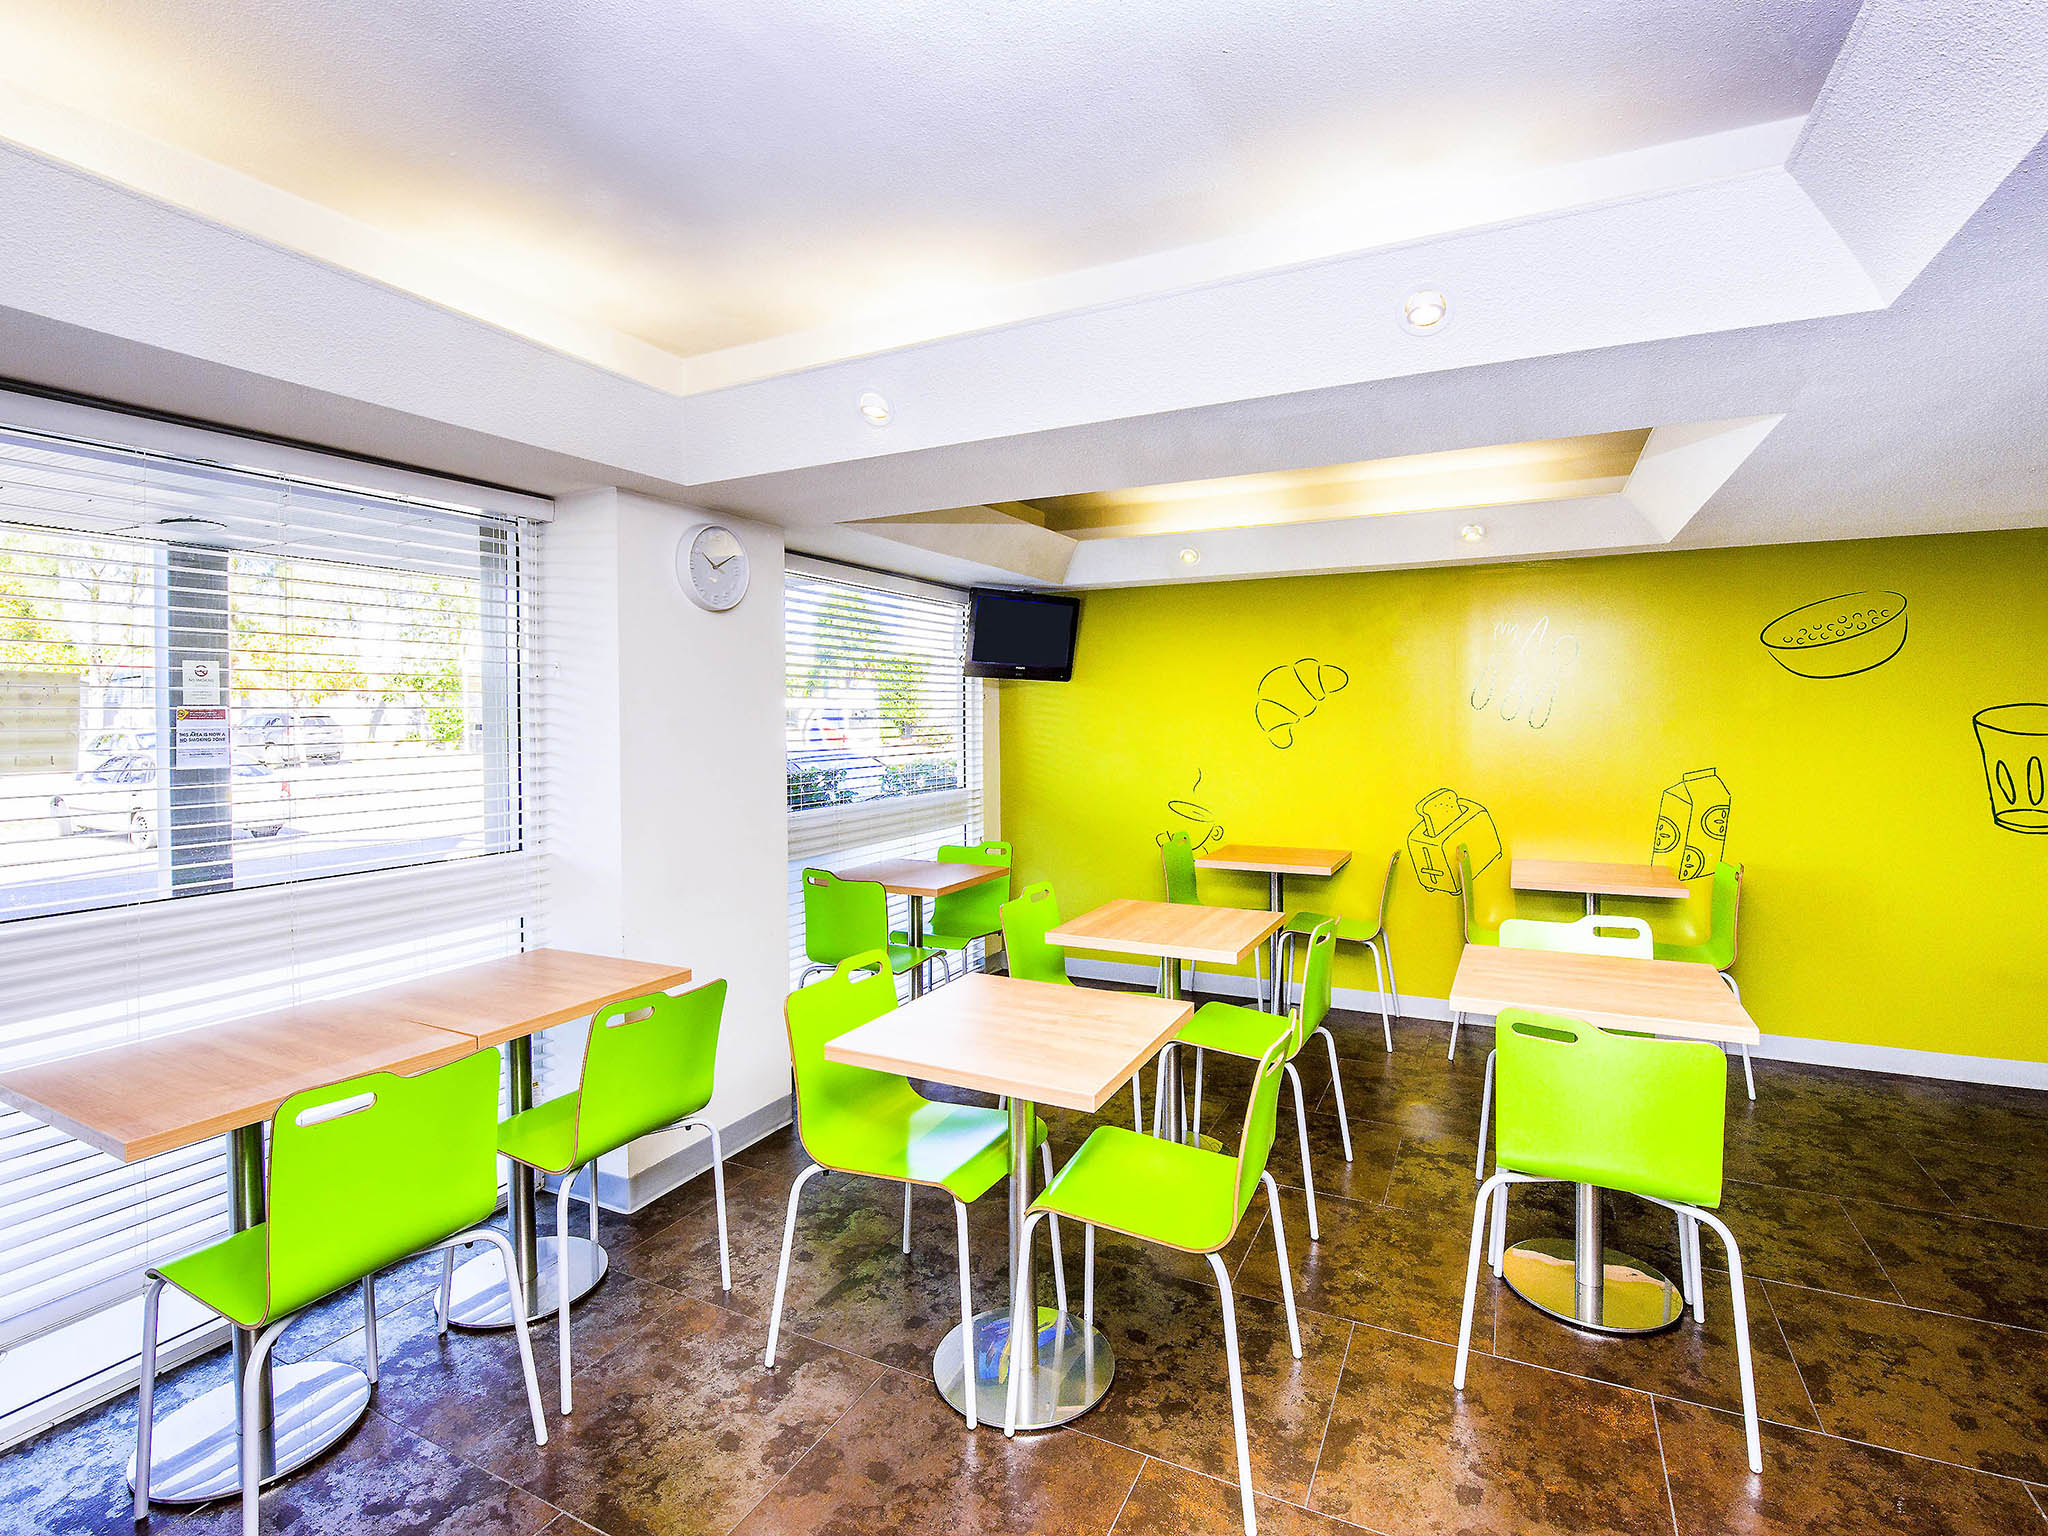 78 Interior Design Job Canberra Knightsbridge